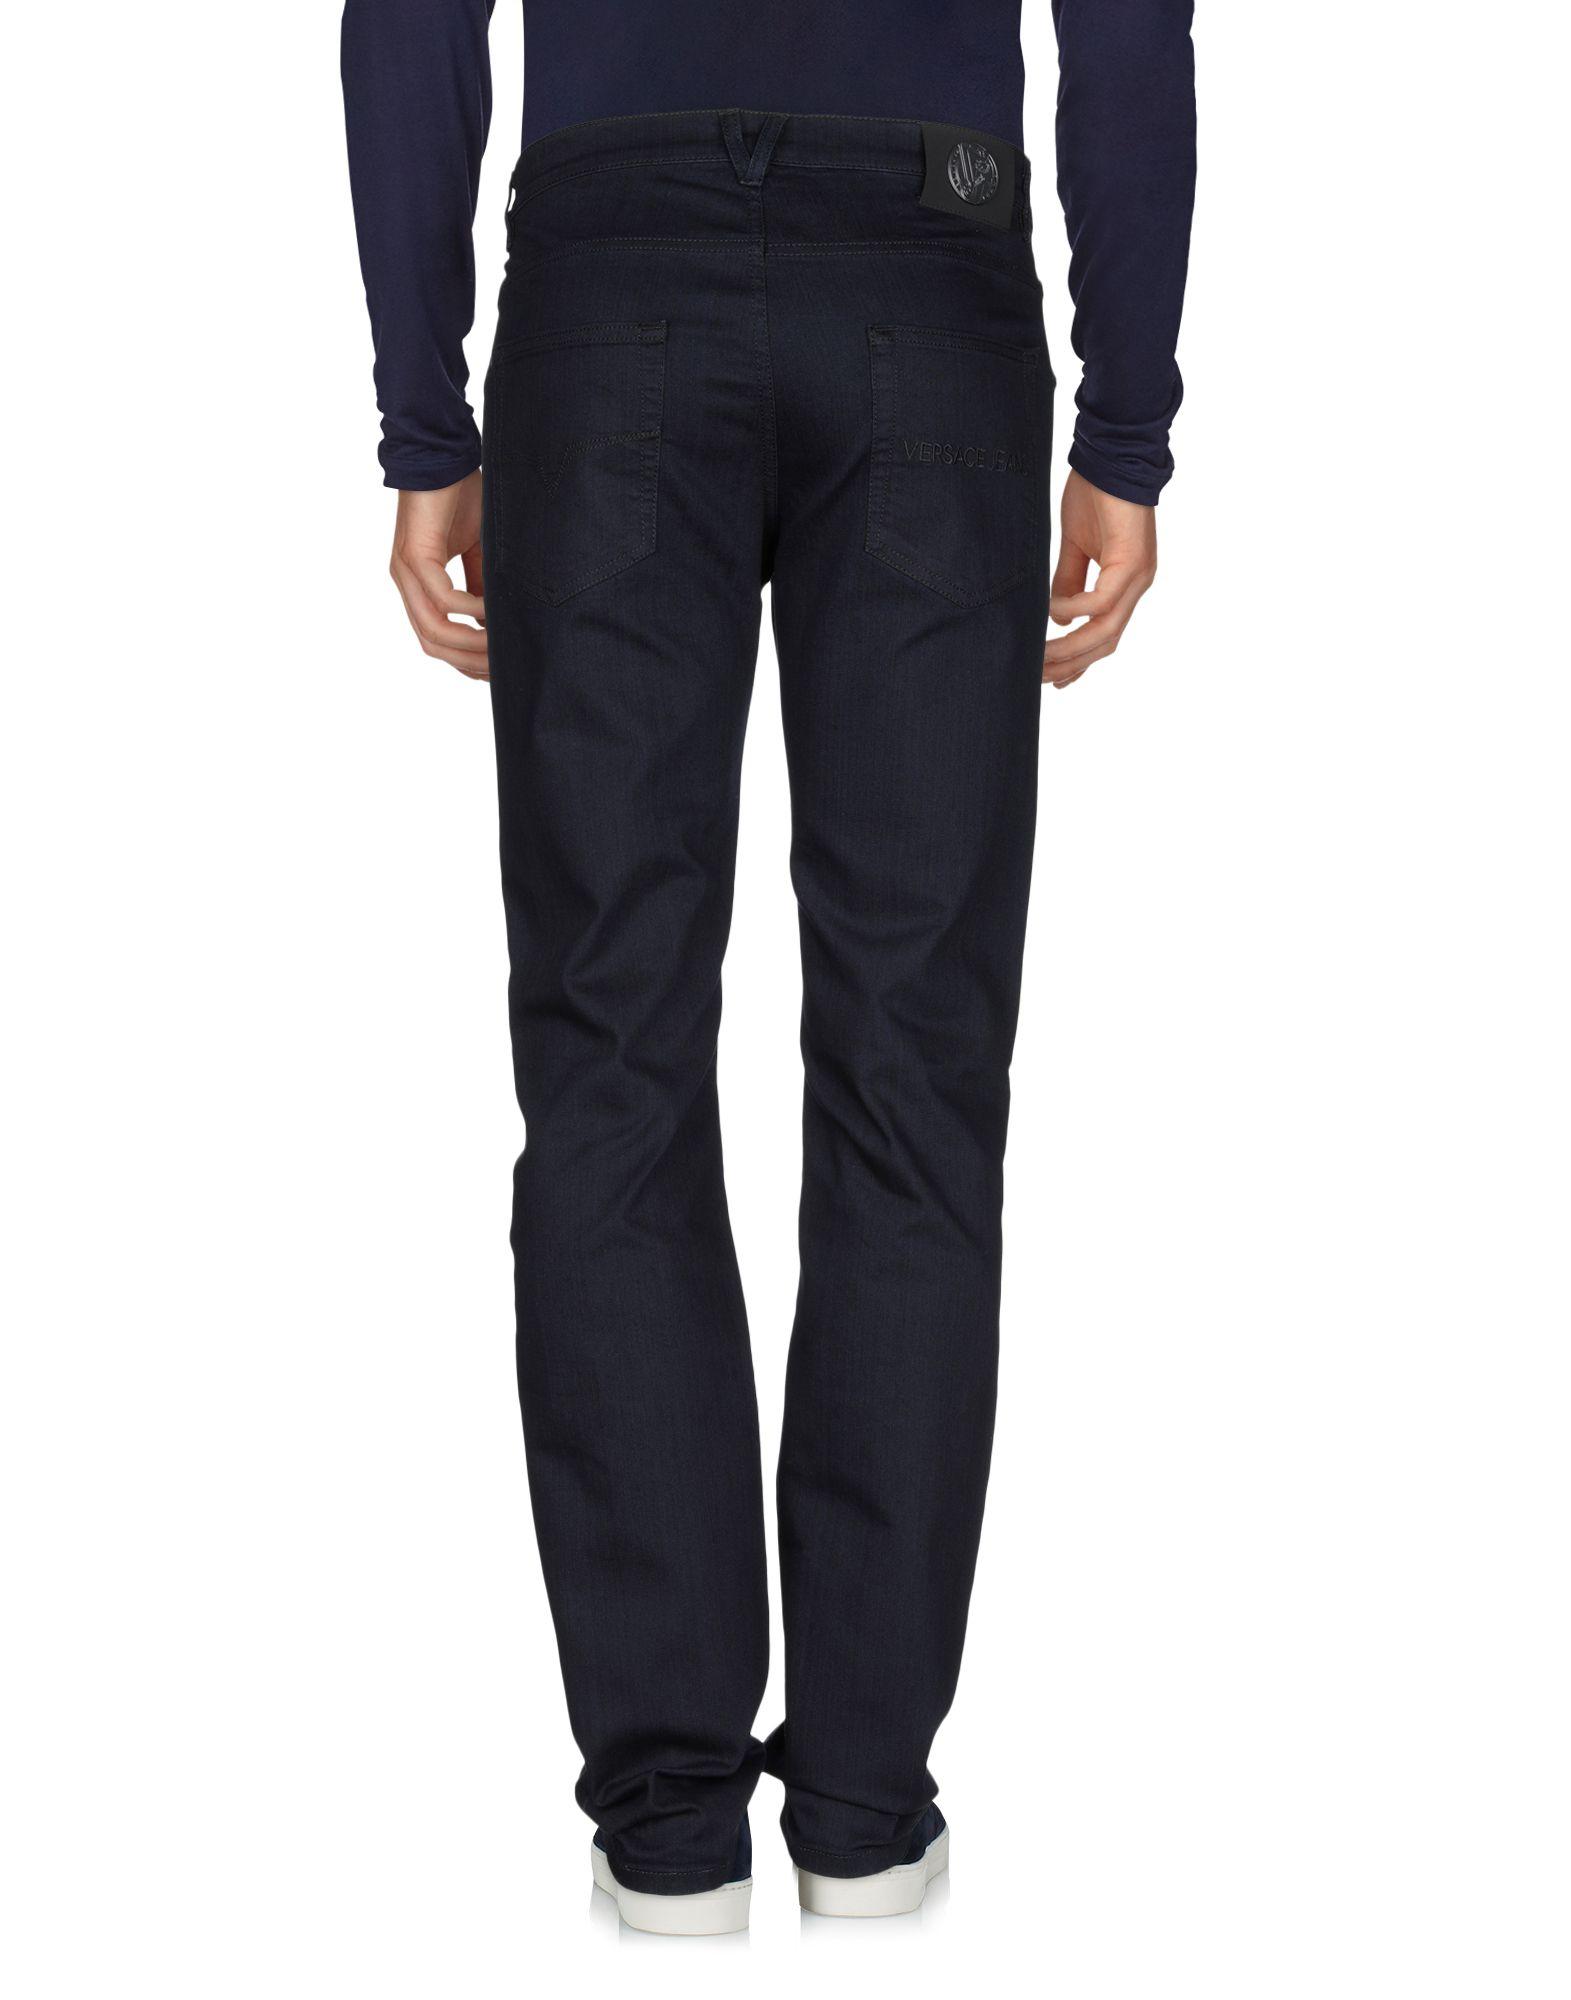 Pantaloni Jeans Versace Versace Versace Jeans Uomo - 42684241VP fa1558